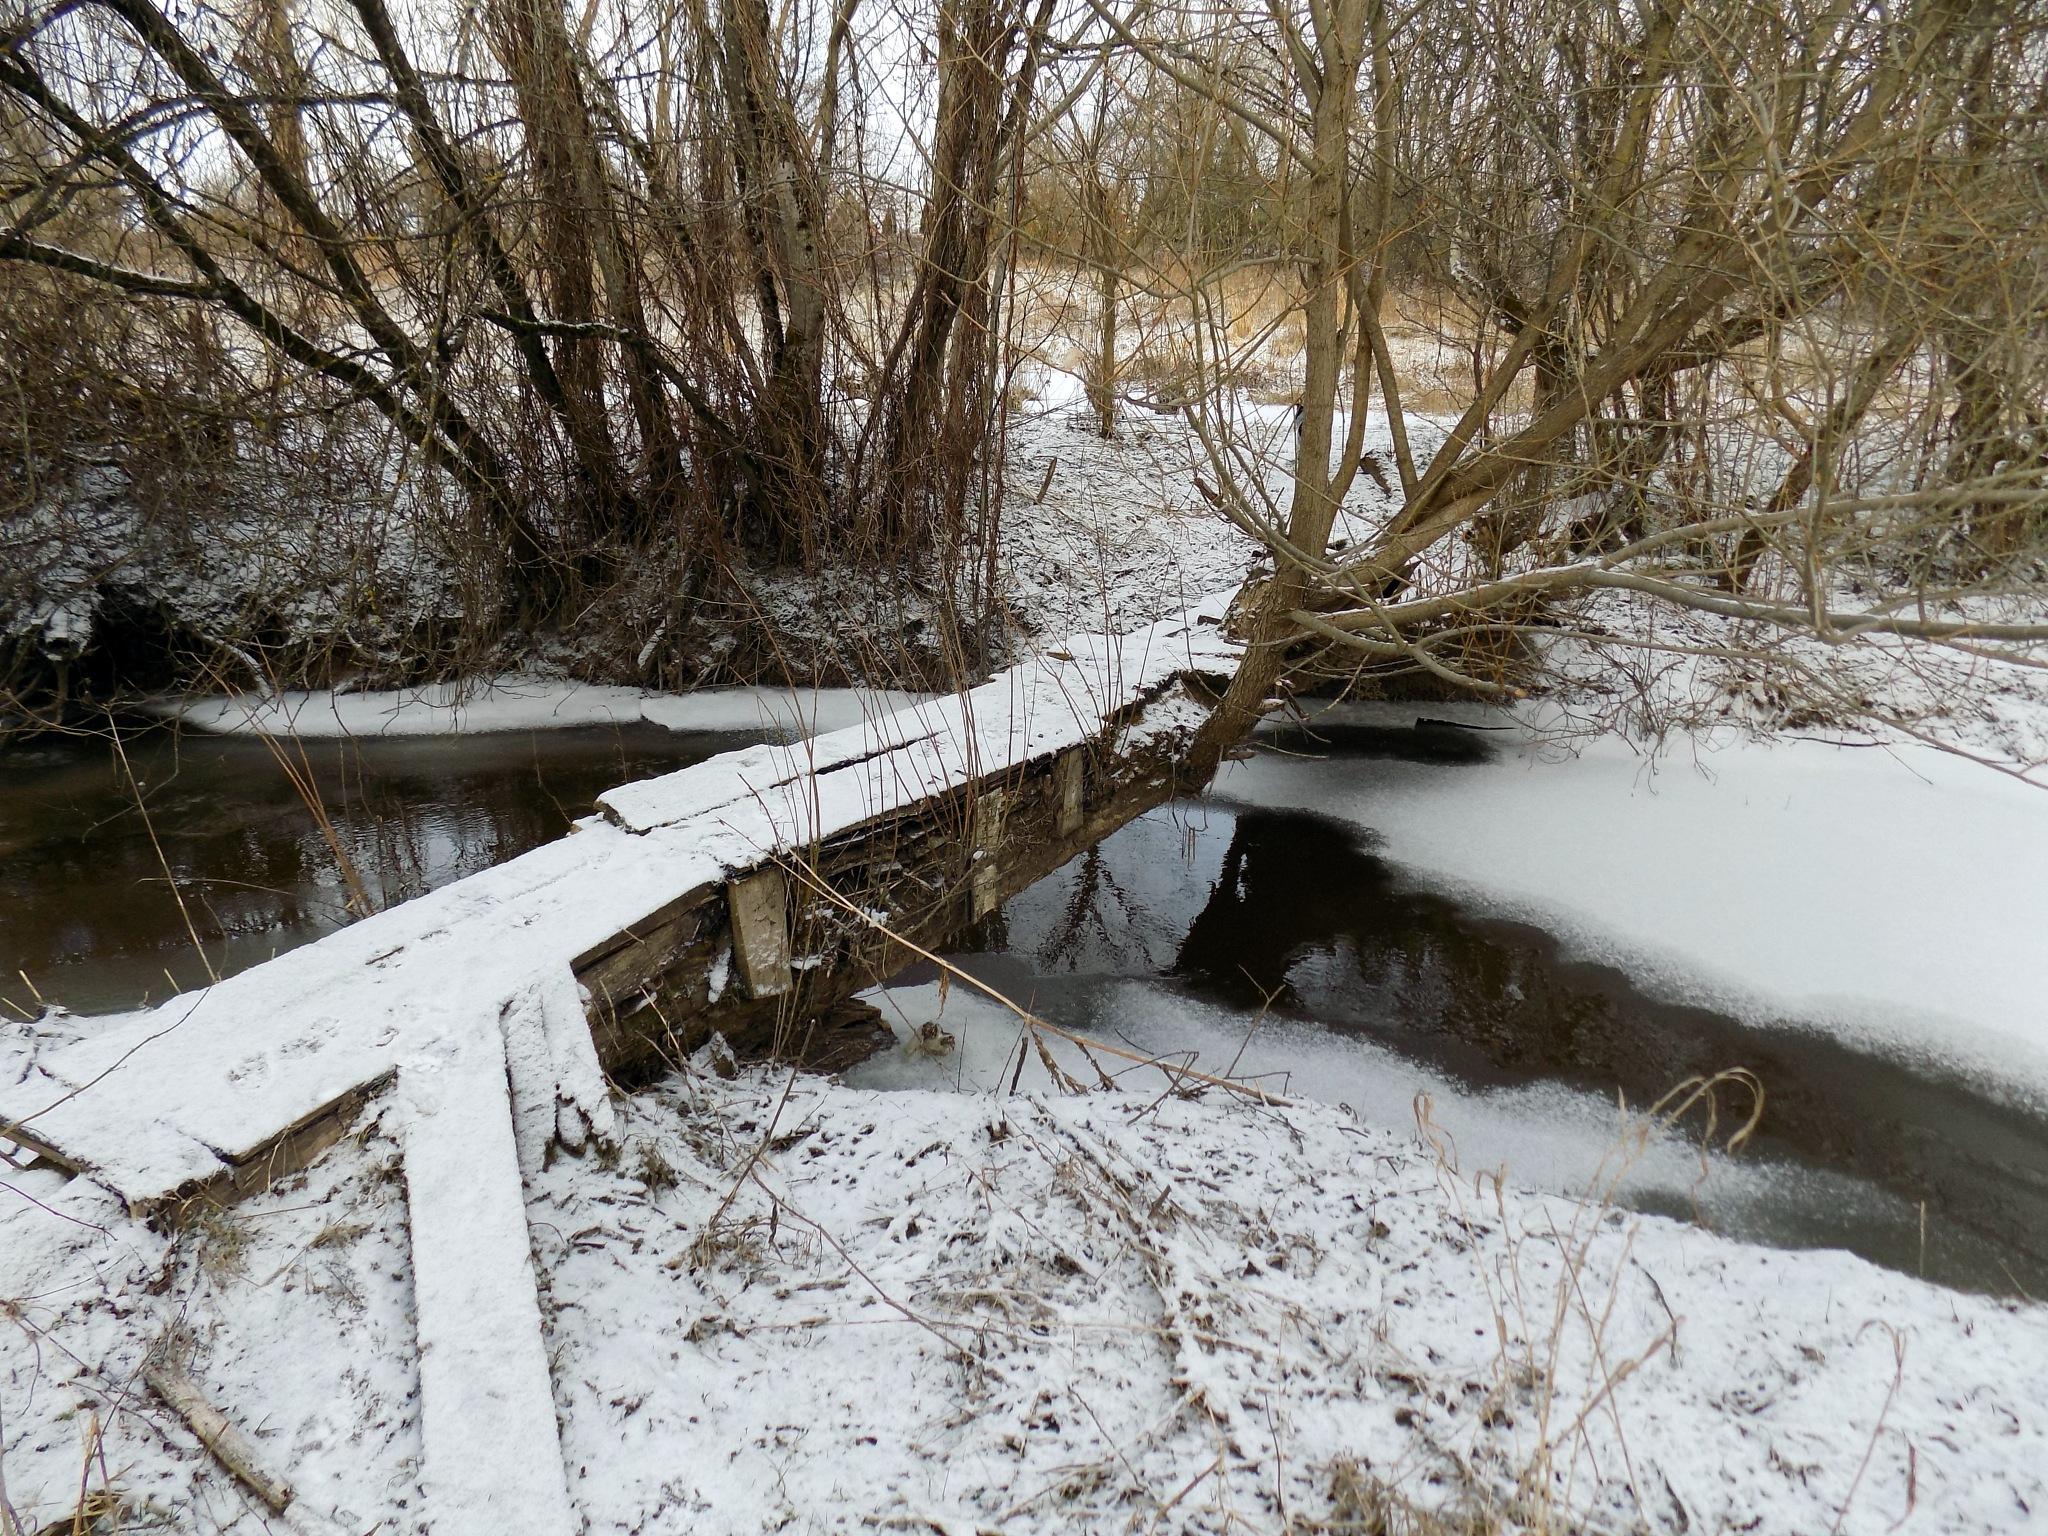 Bridge across the stream by uzkuraitiene62